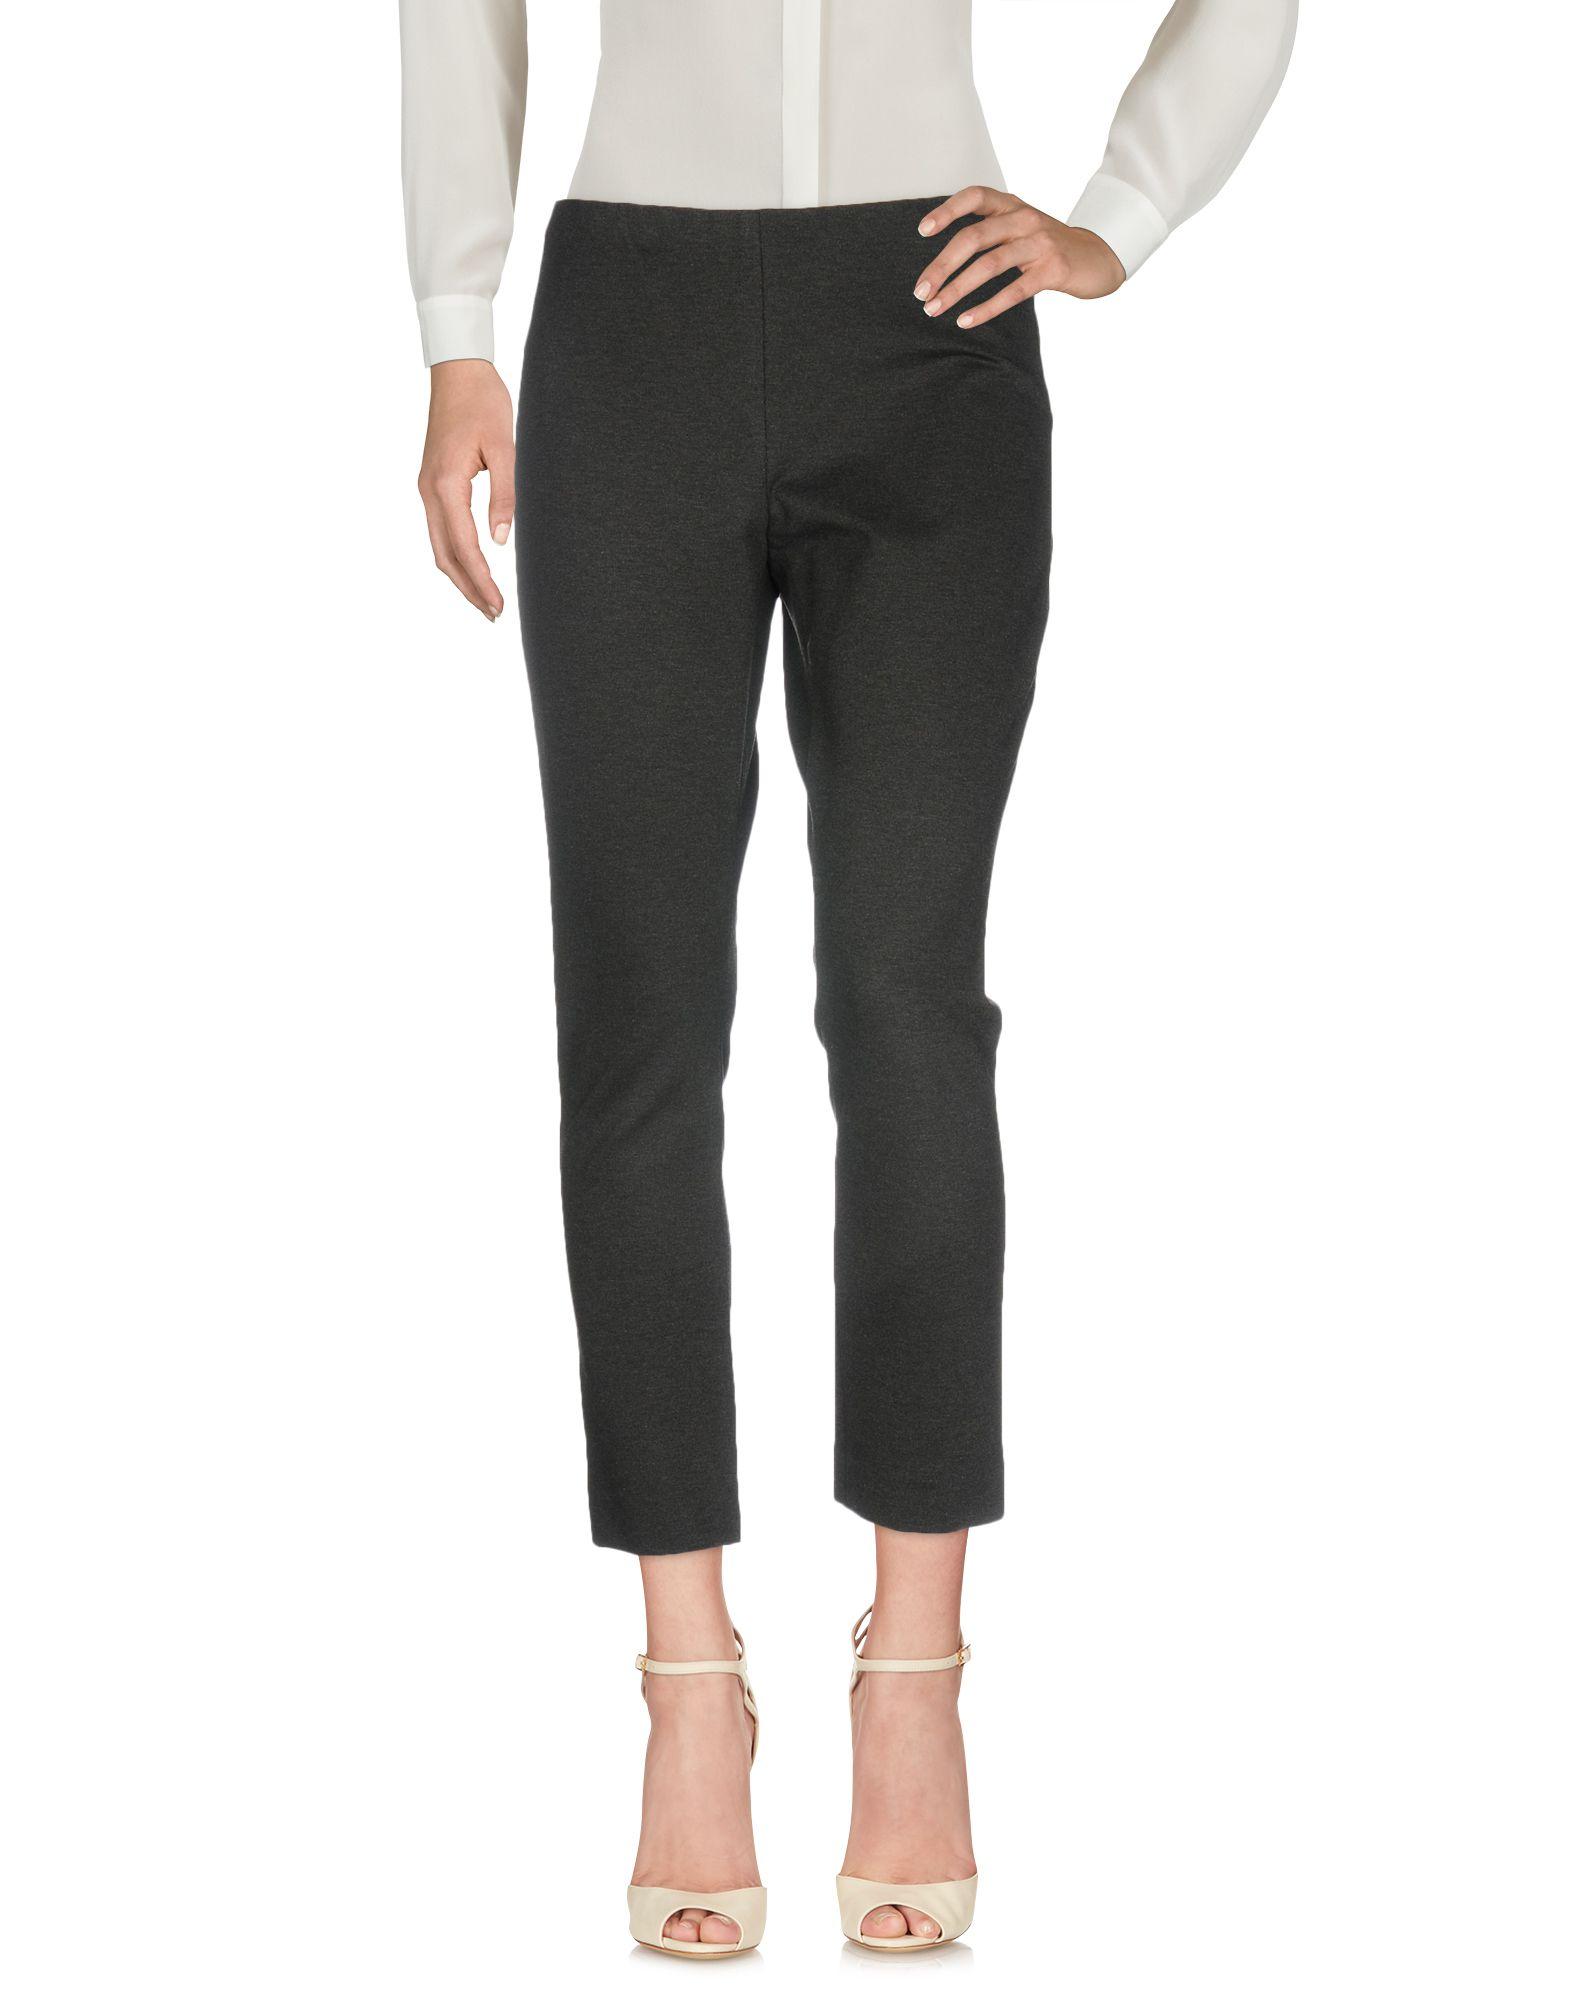 Pantalone Donna Karan Donna - Acquista online su c5MeiAHGAl